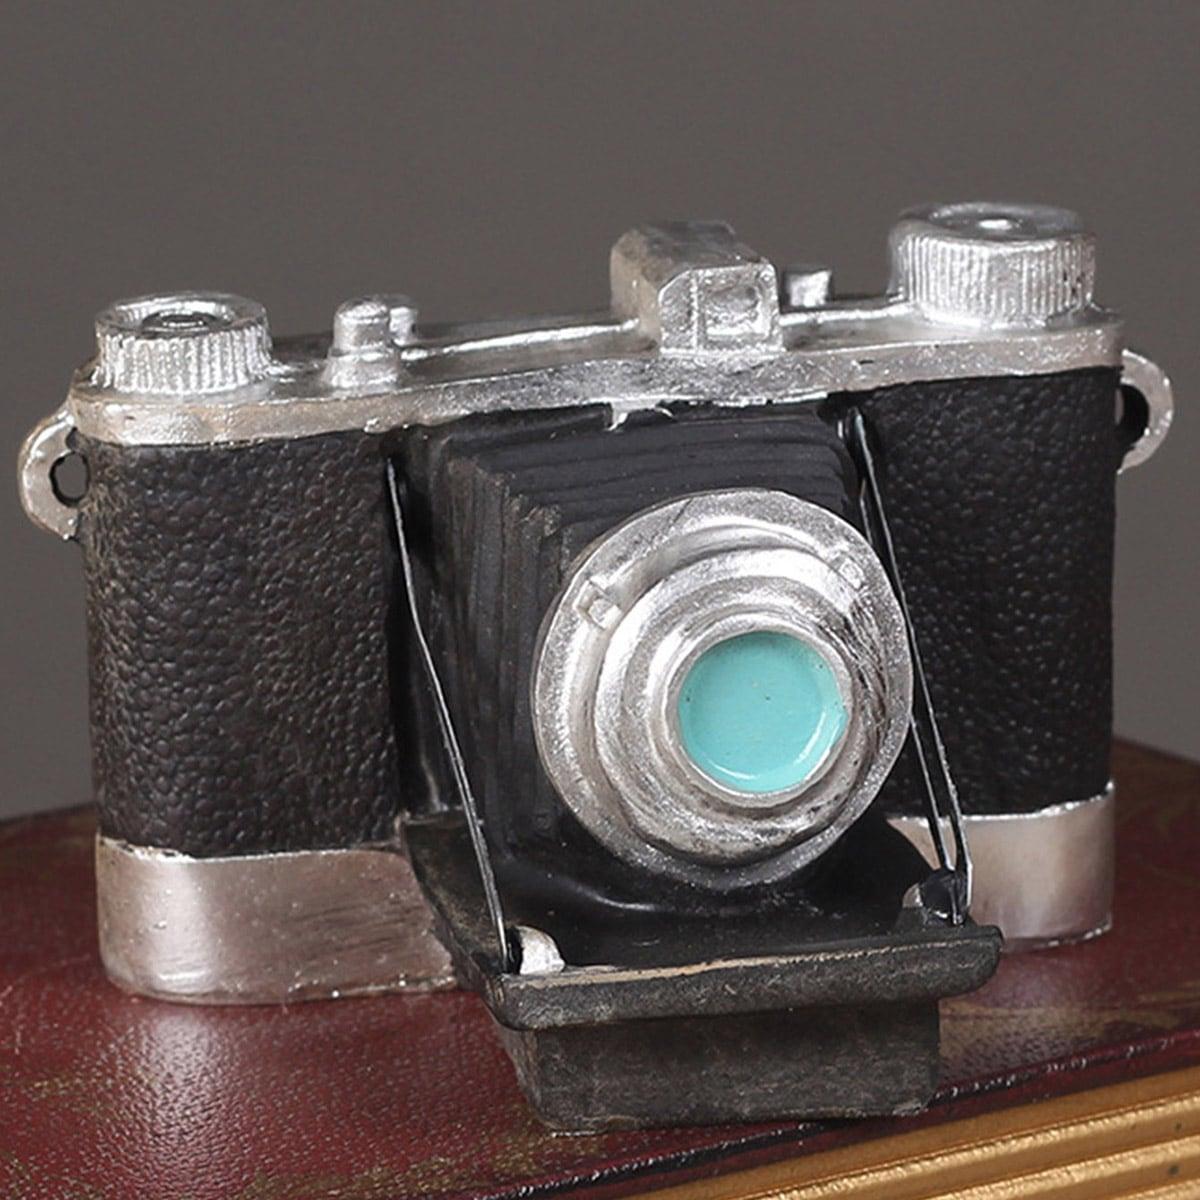 Cameravormig decoratief object